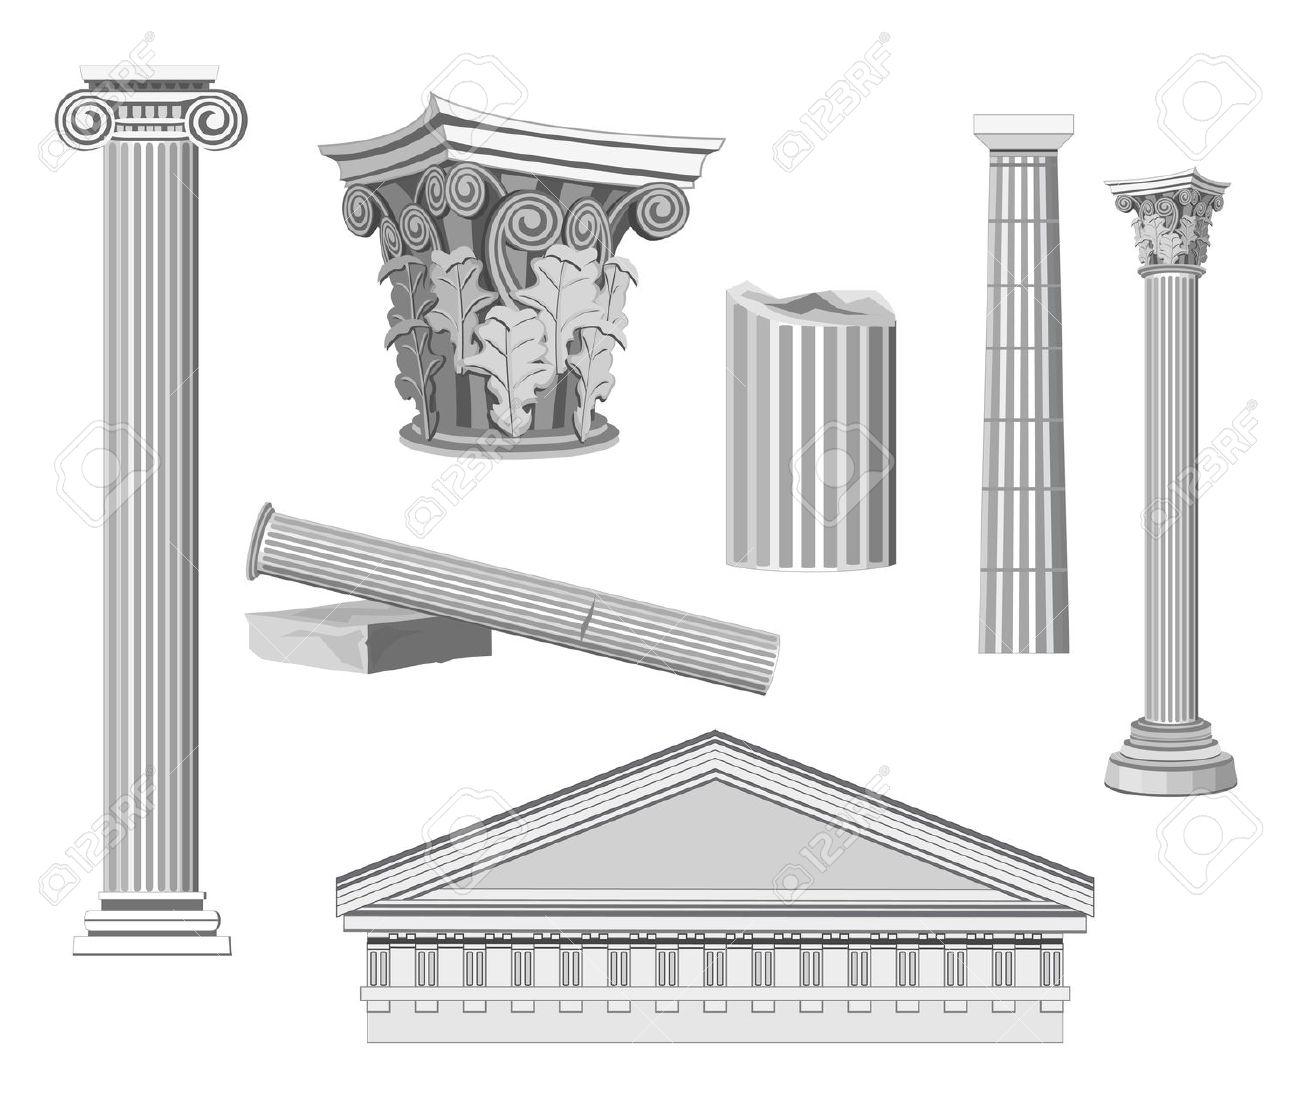 Architectural elements clipart.